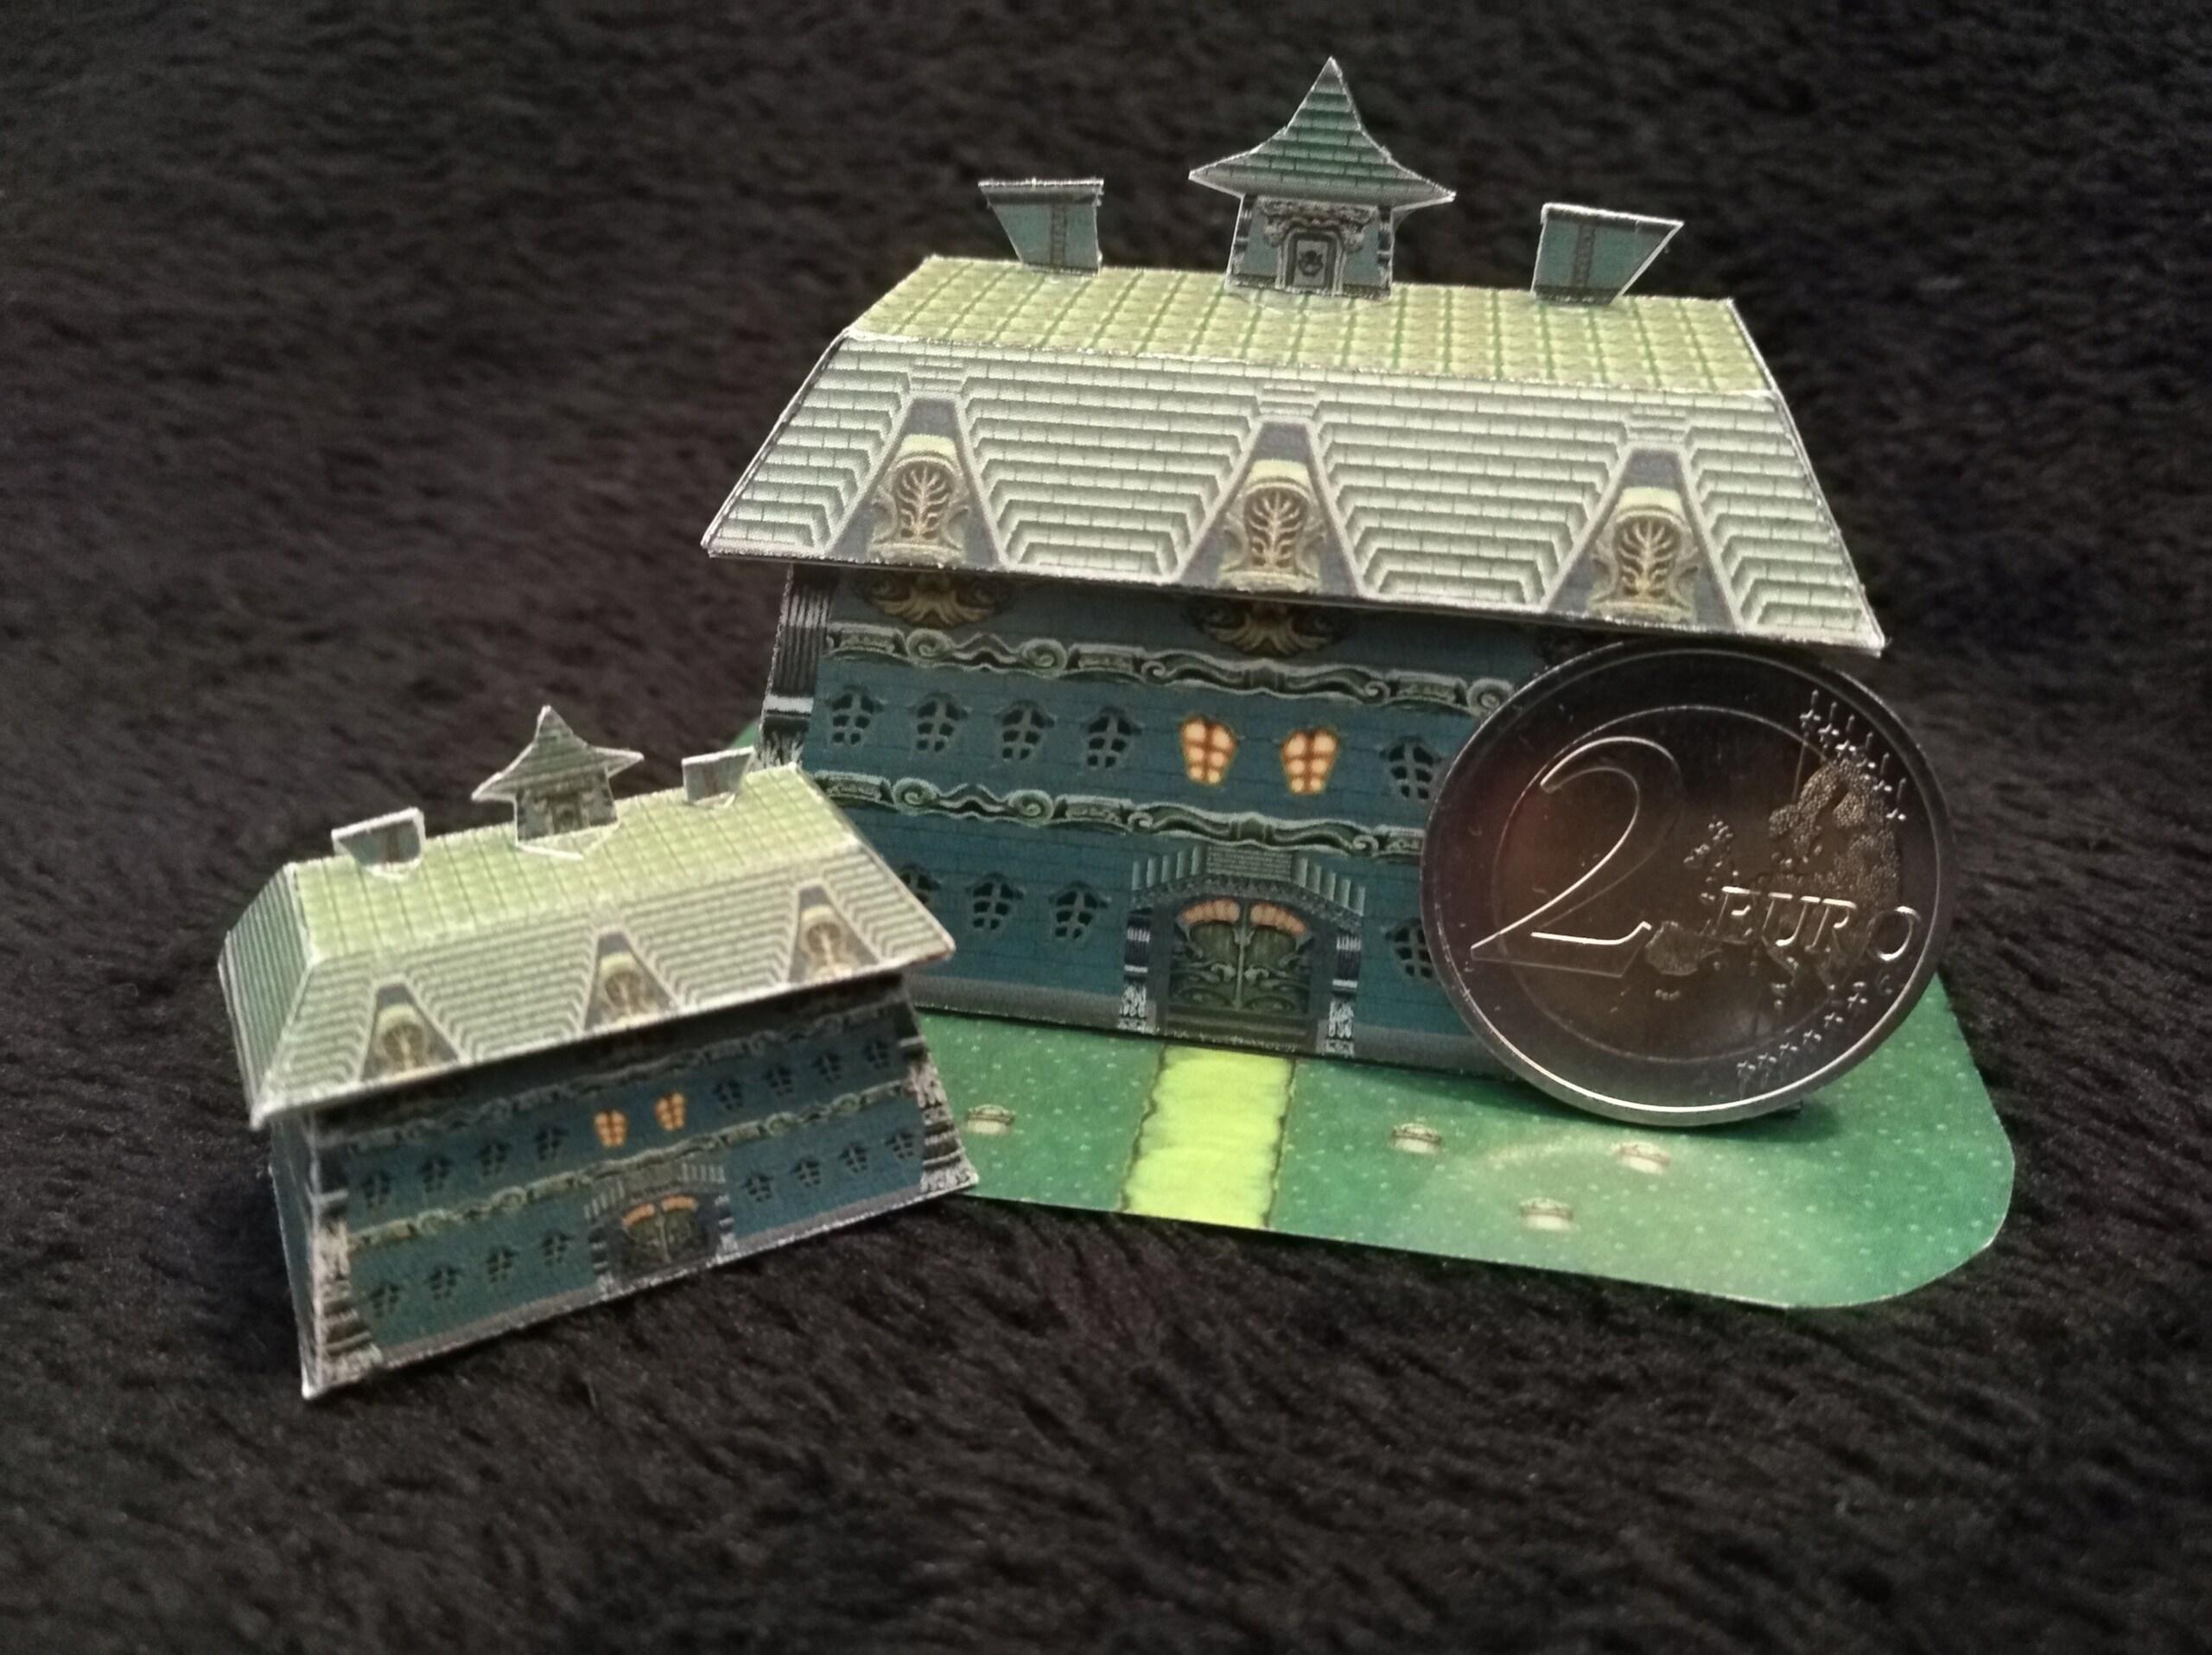 Luigi's Mansion - Die Gruselvilla aus dem Gamecube-Klassiker Img_2033